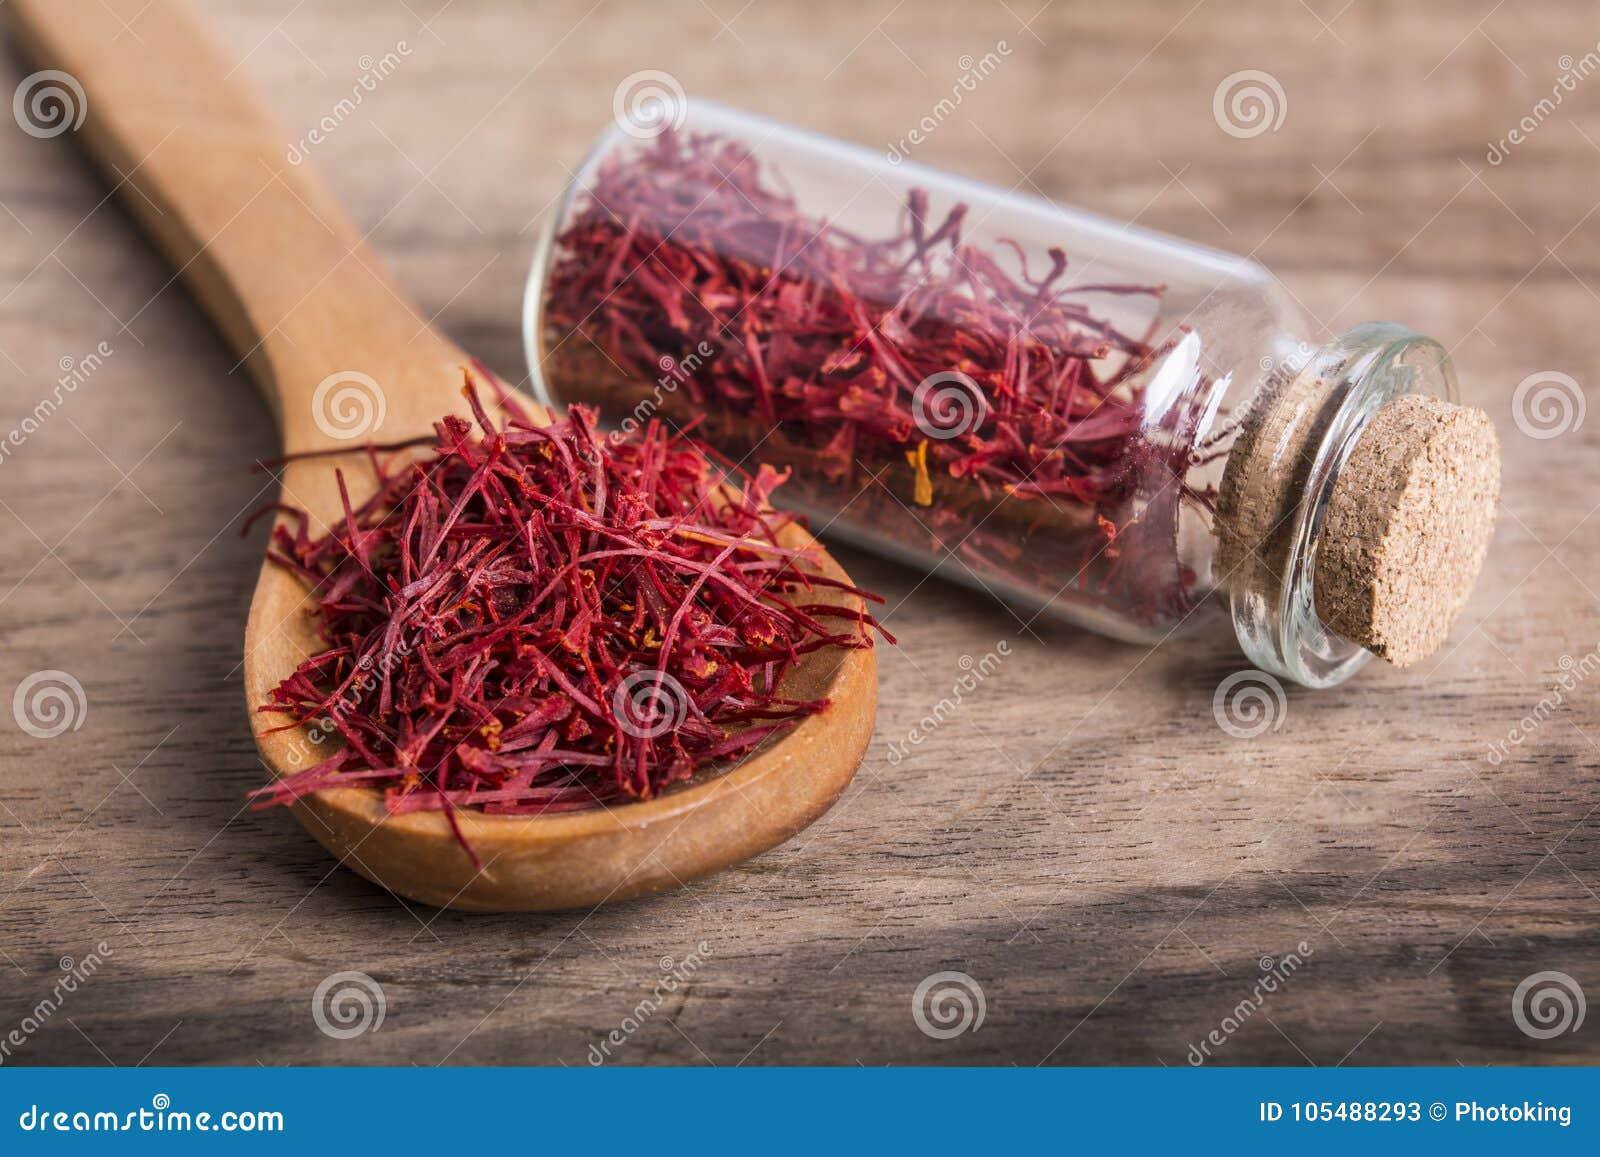 Saffron Spice Stock Image Image Of Herb Flavor Flower 105488293